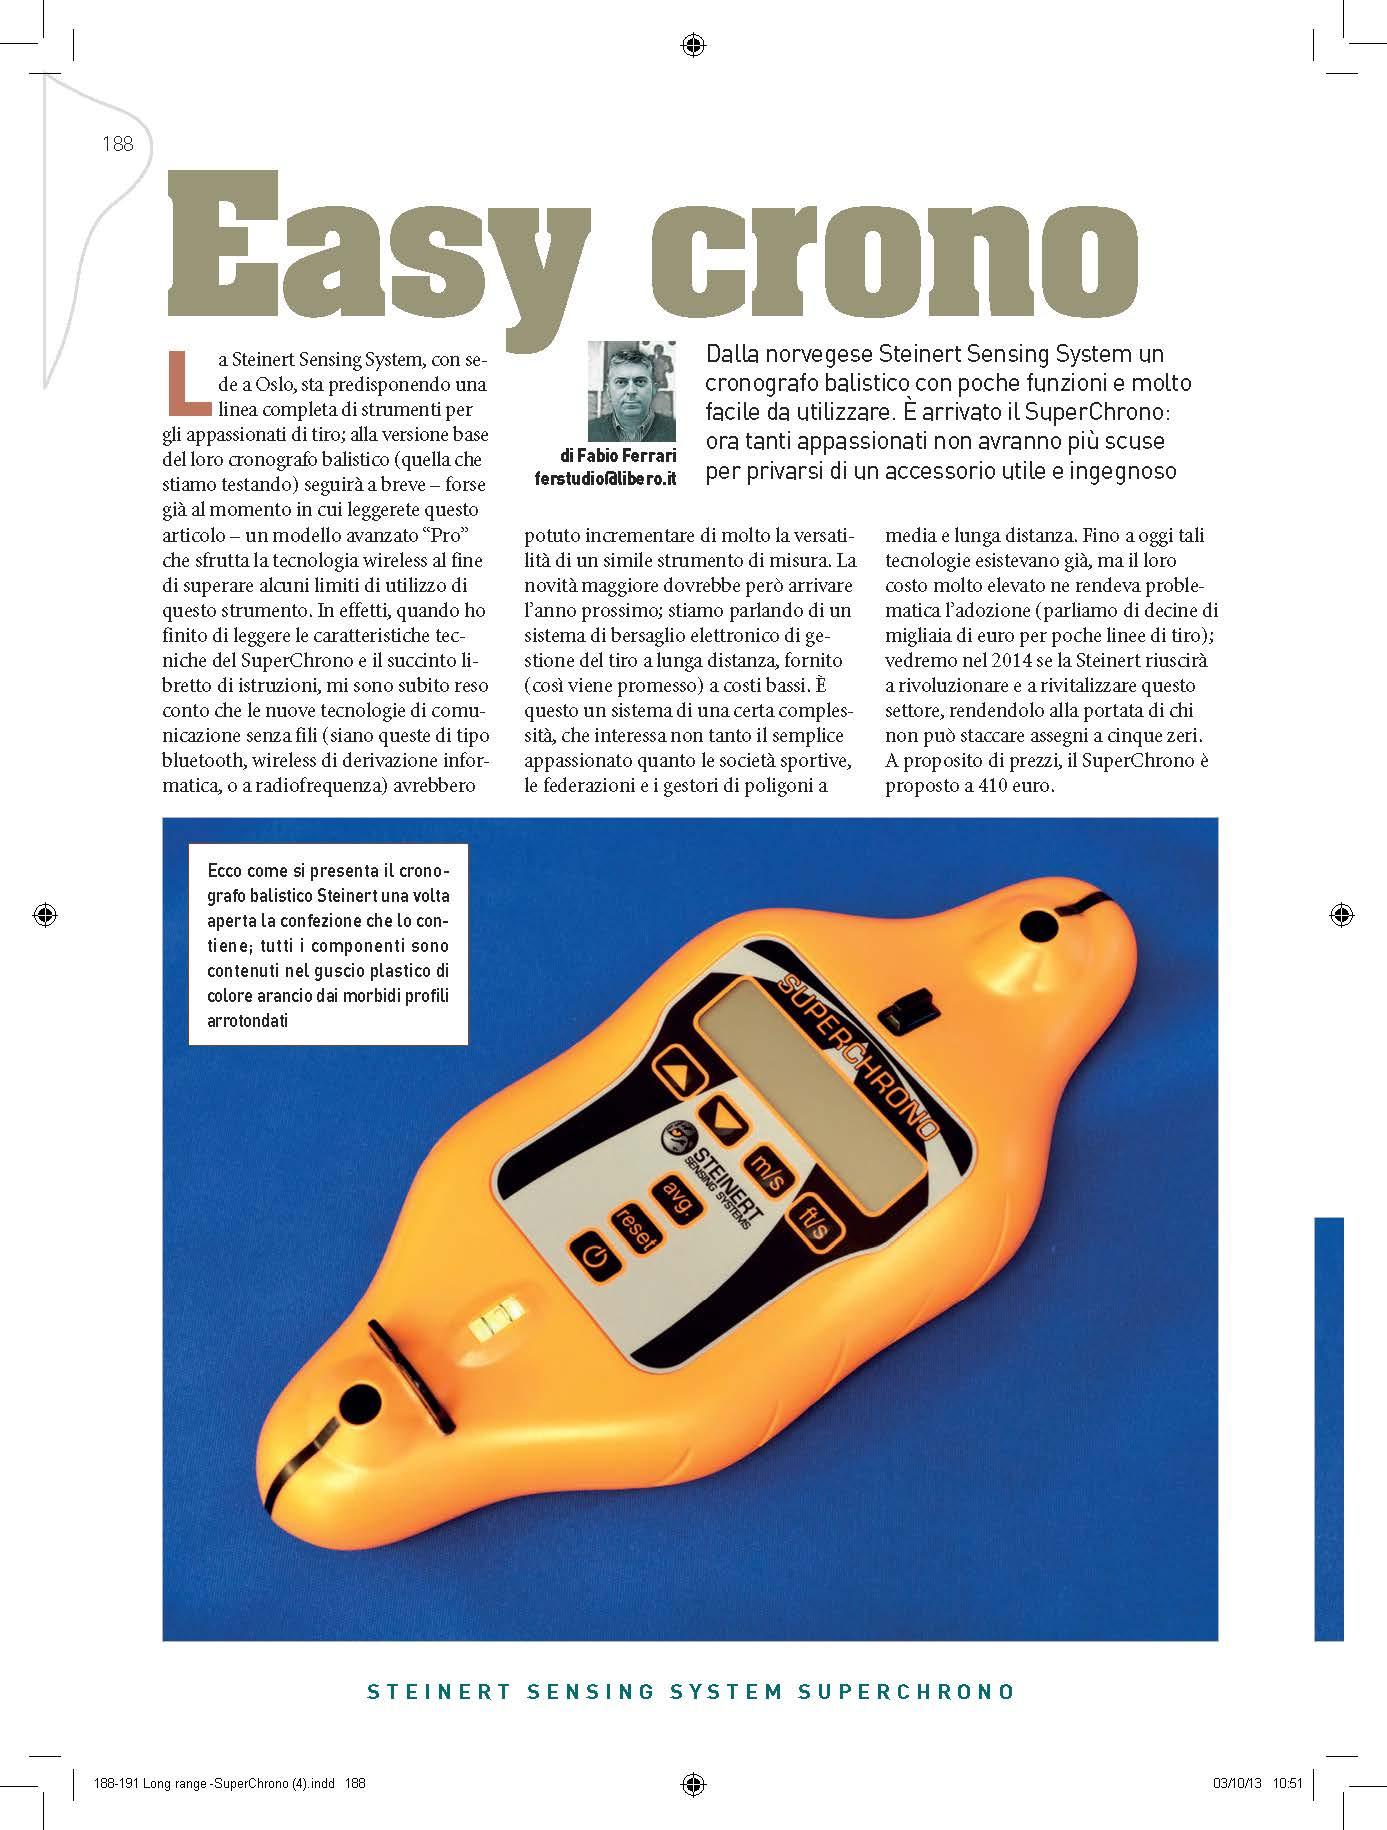 Armi Magazine November 2013 (3)_Page_1